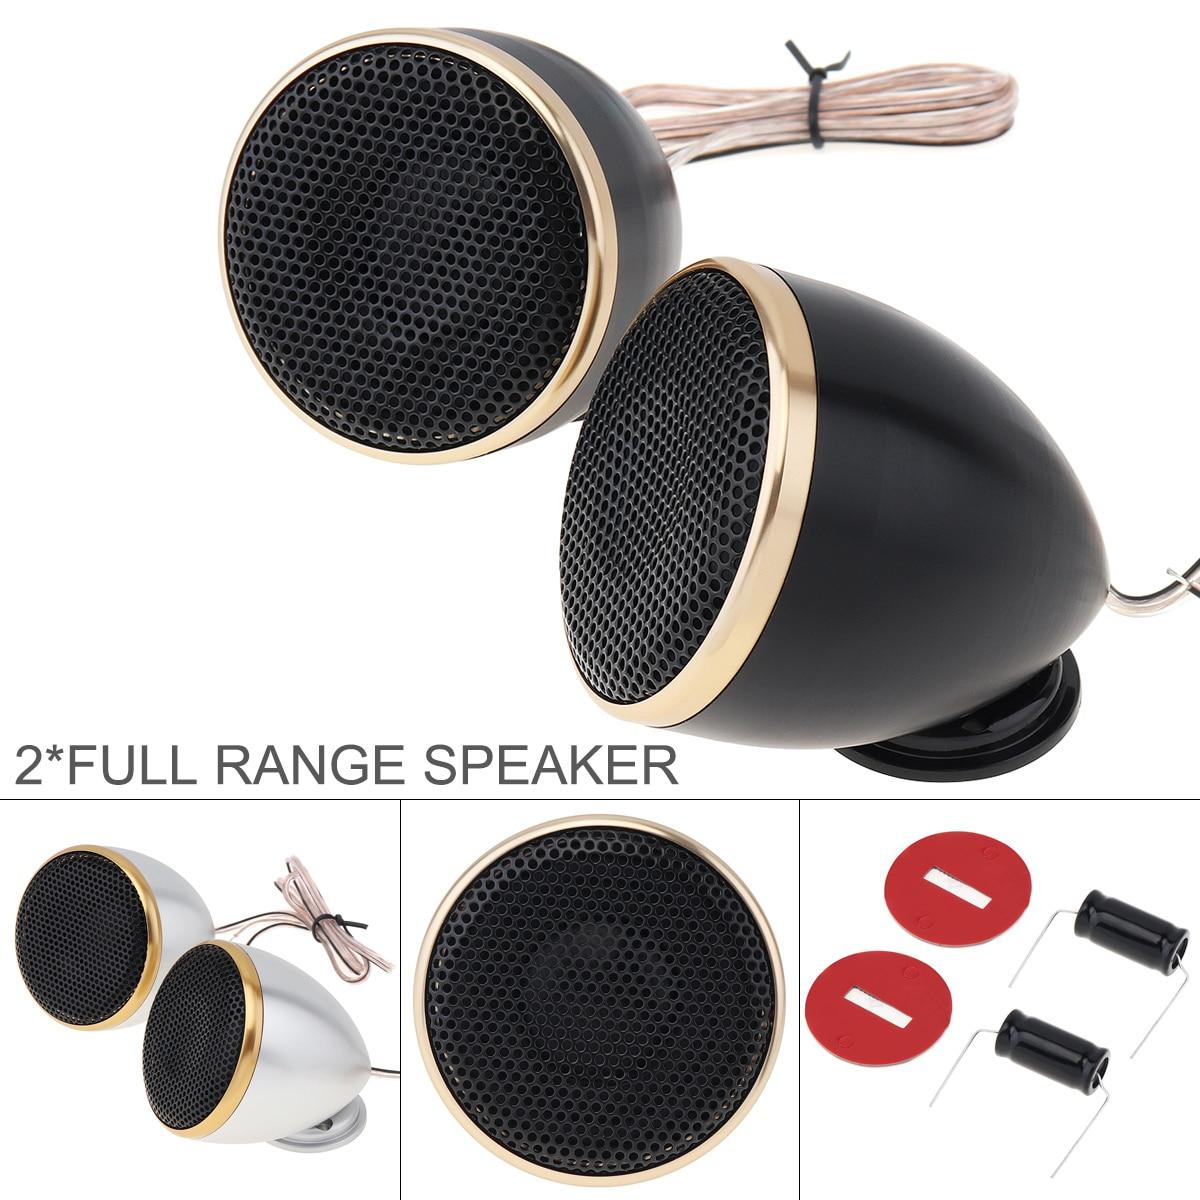 2pcs 2.5 Inch Aluminum Midrange Car Tweeter Speaker 4 Ohm 200W HIFI Music Speakers for Car Audio System For Car Vehicles